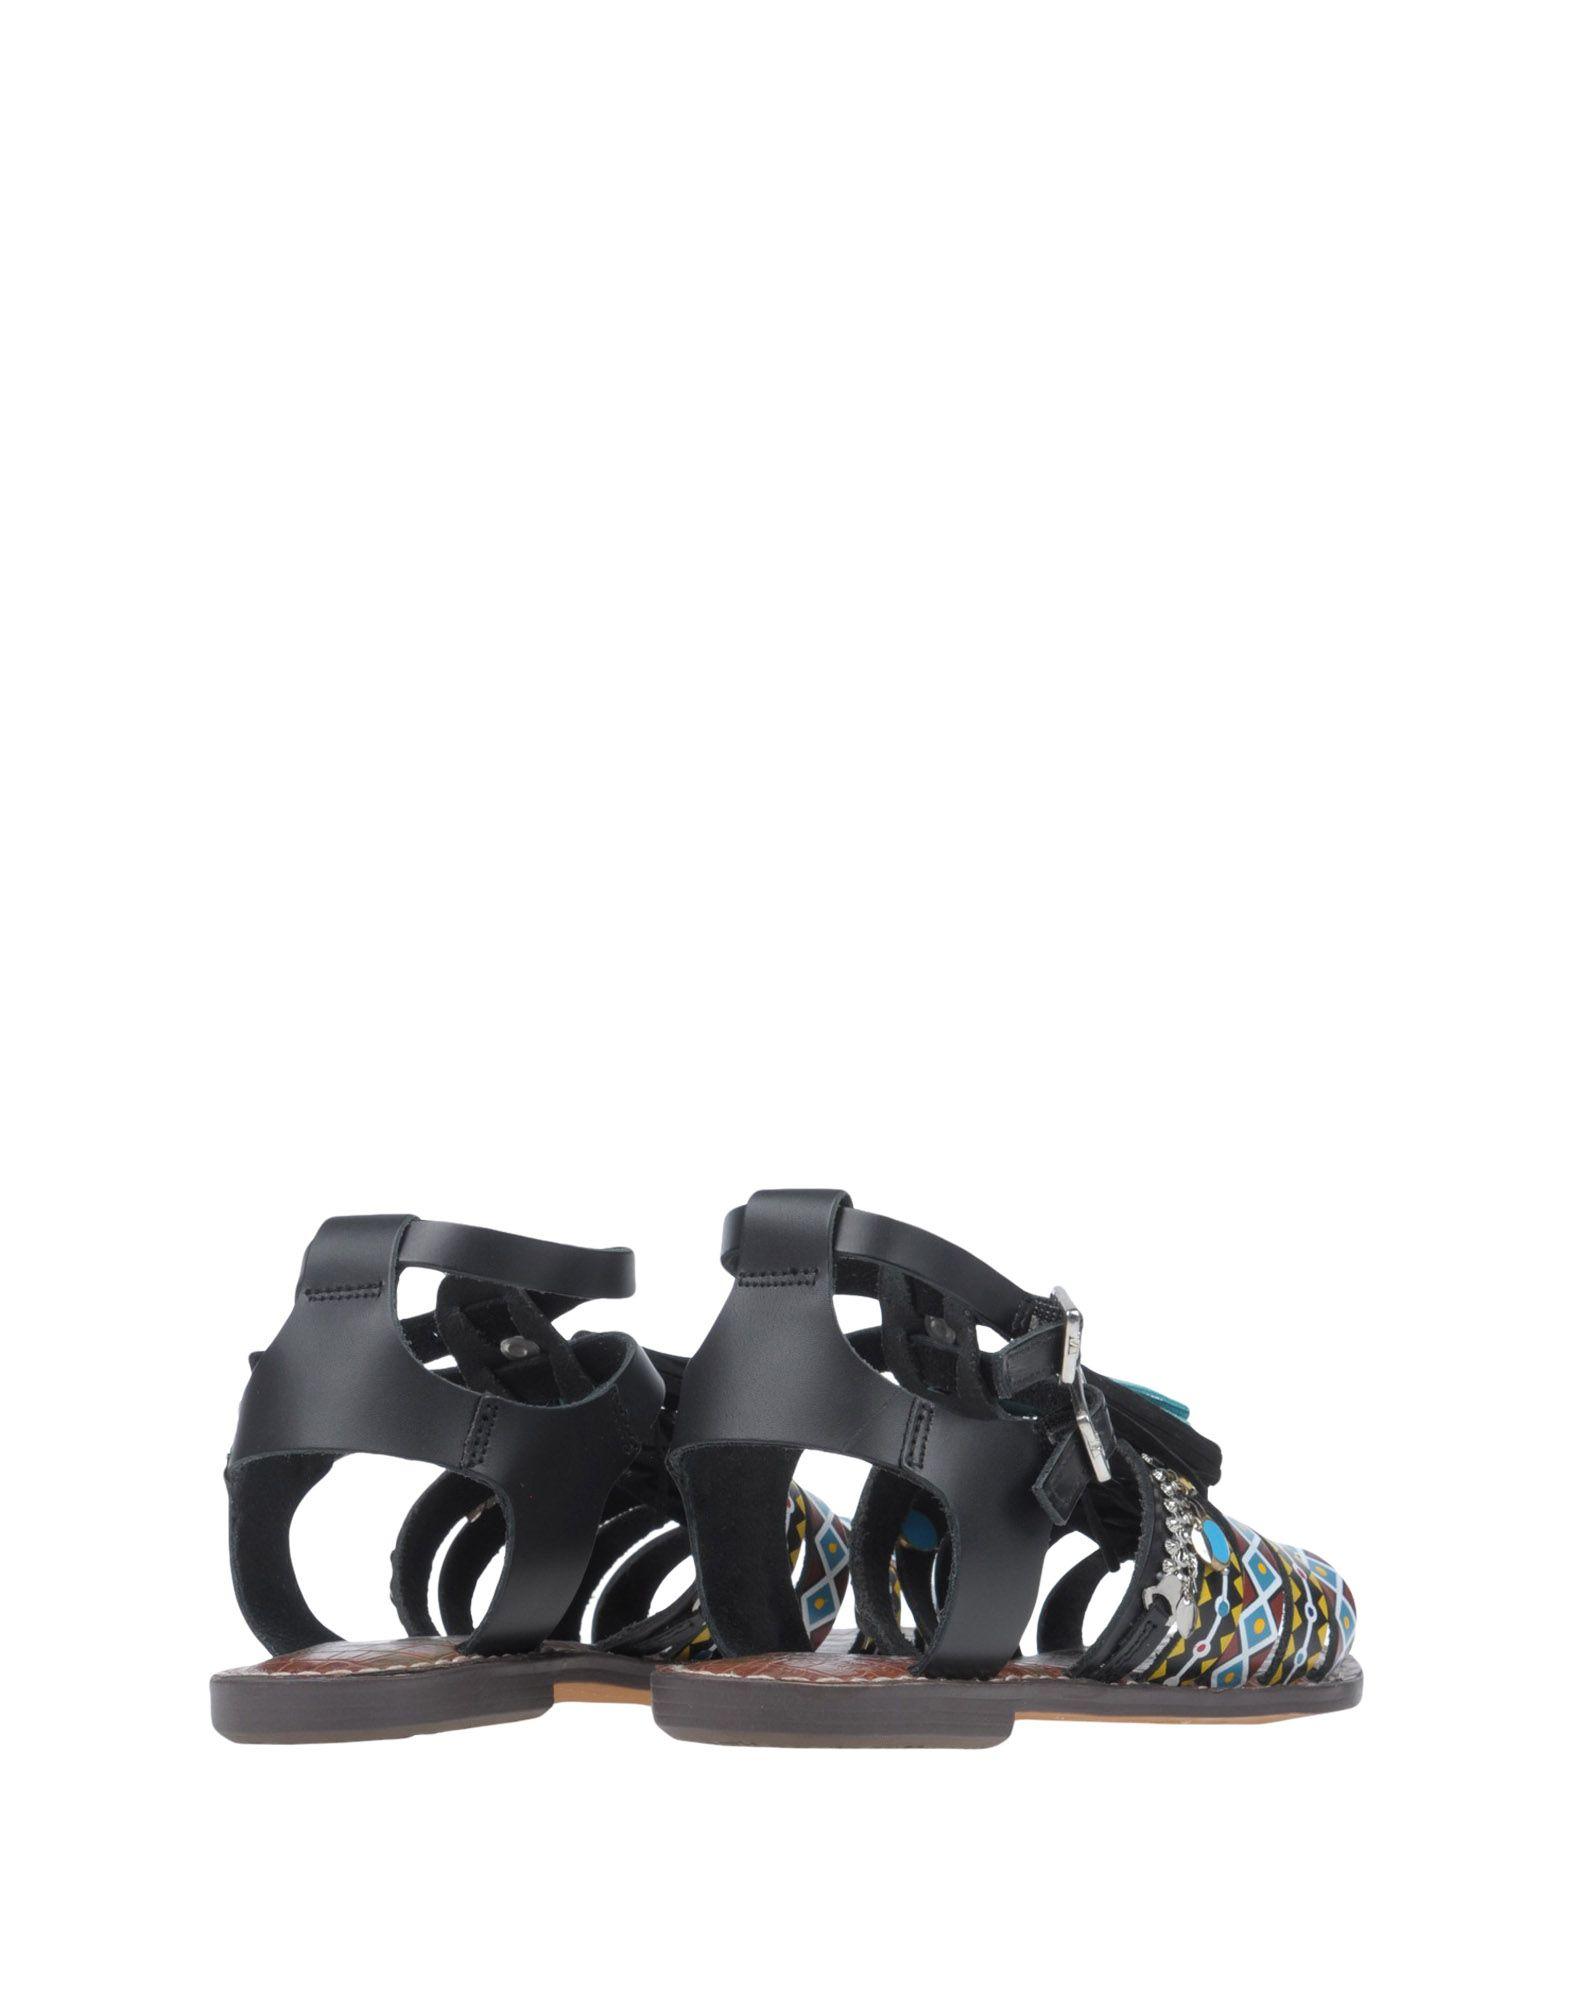 Sam Edelman Sandalen beliebte Damen 11391953XF Gute Qualität beliebte Sandalen Schuhe 8c82e3